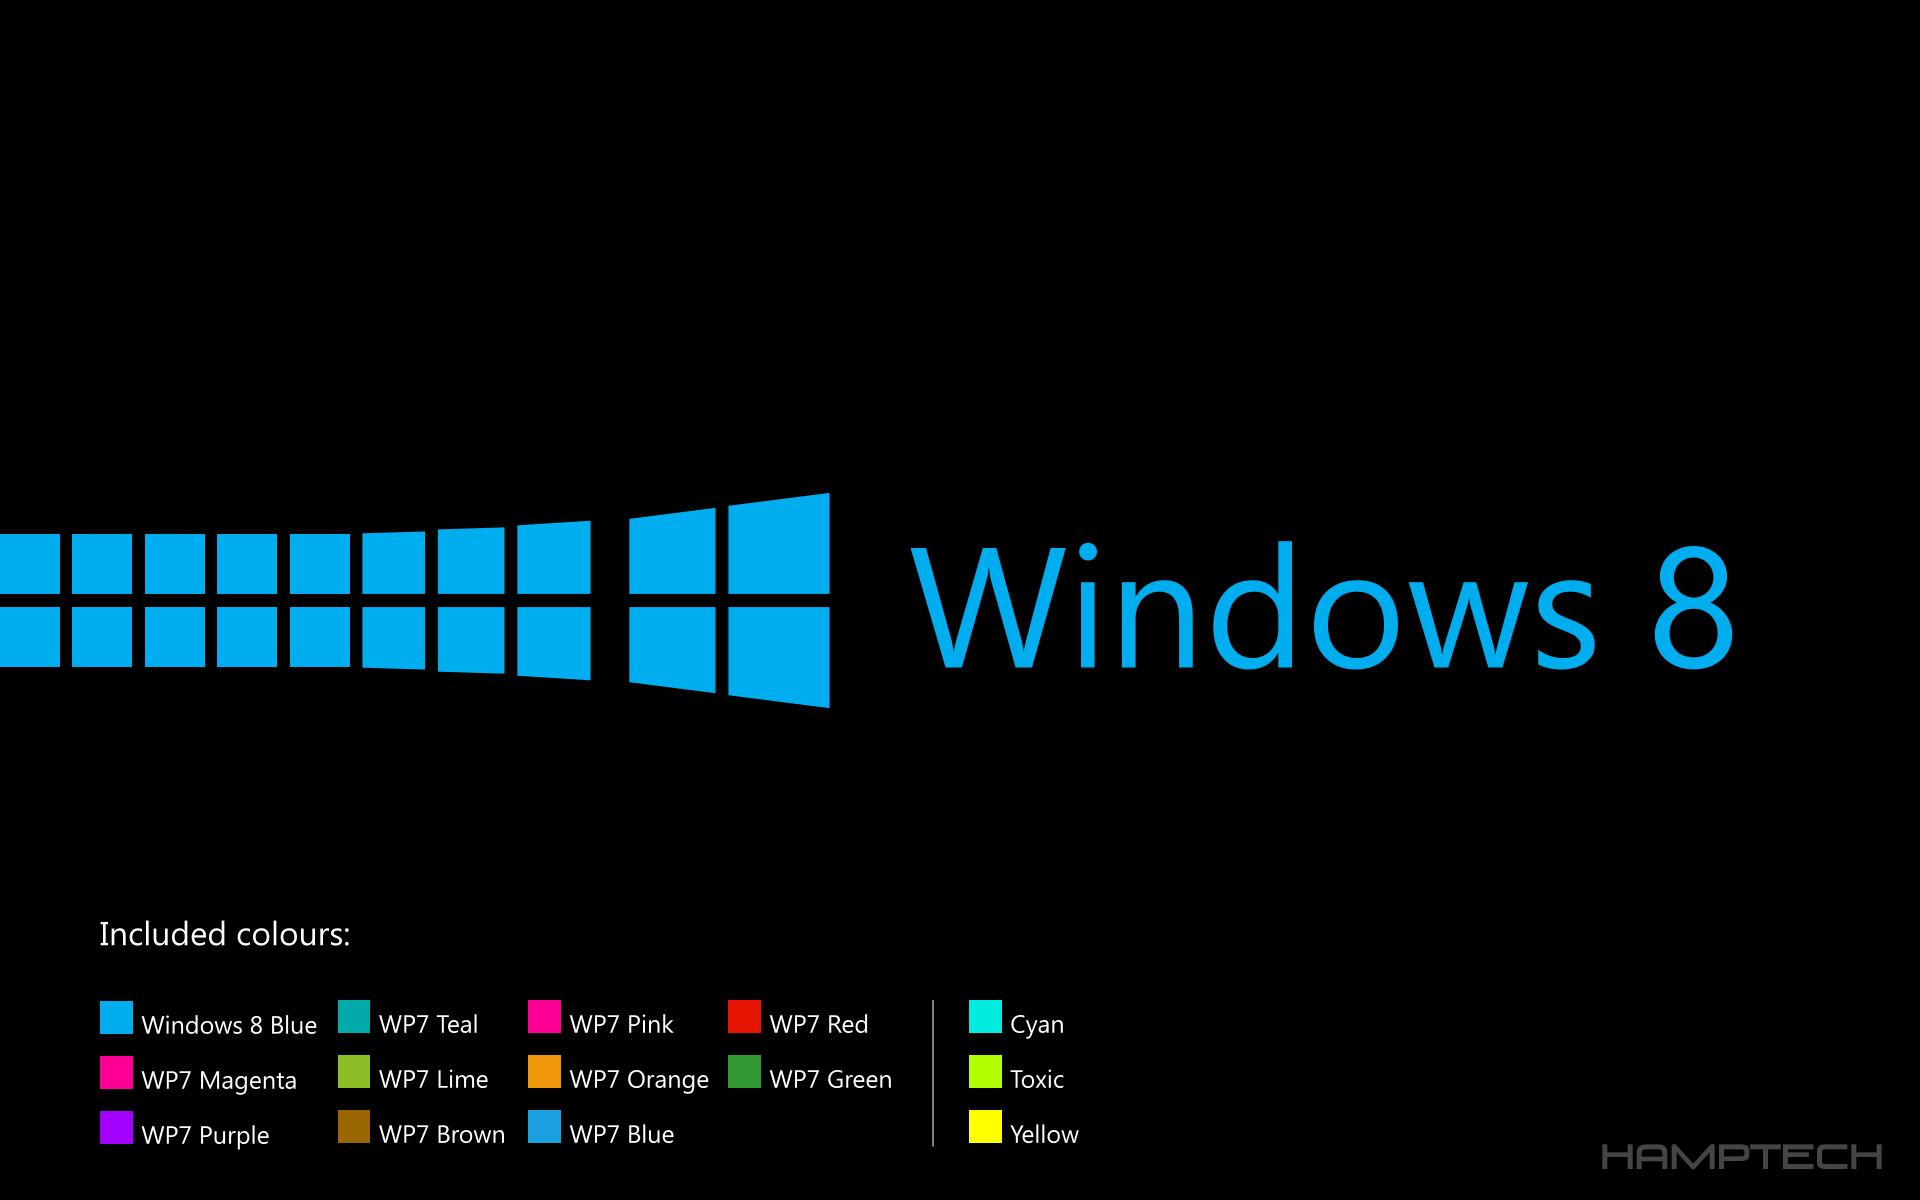 Windows 8 Lockscreen Wallpaperpack BlackEdition By Hamptech On